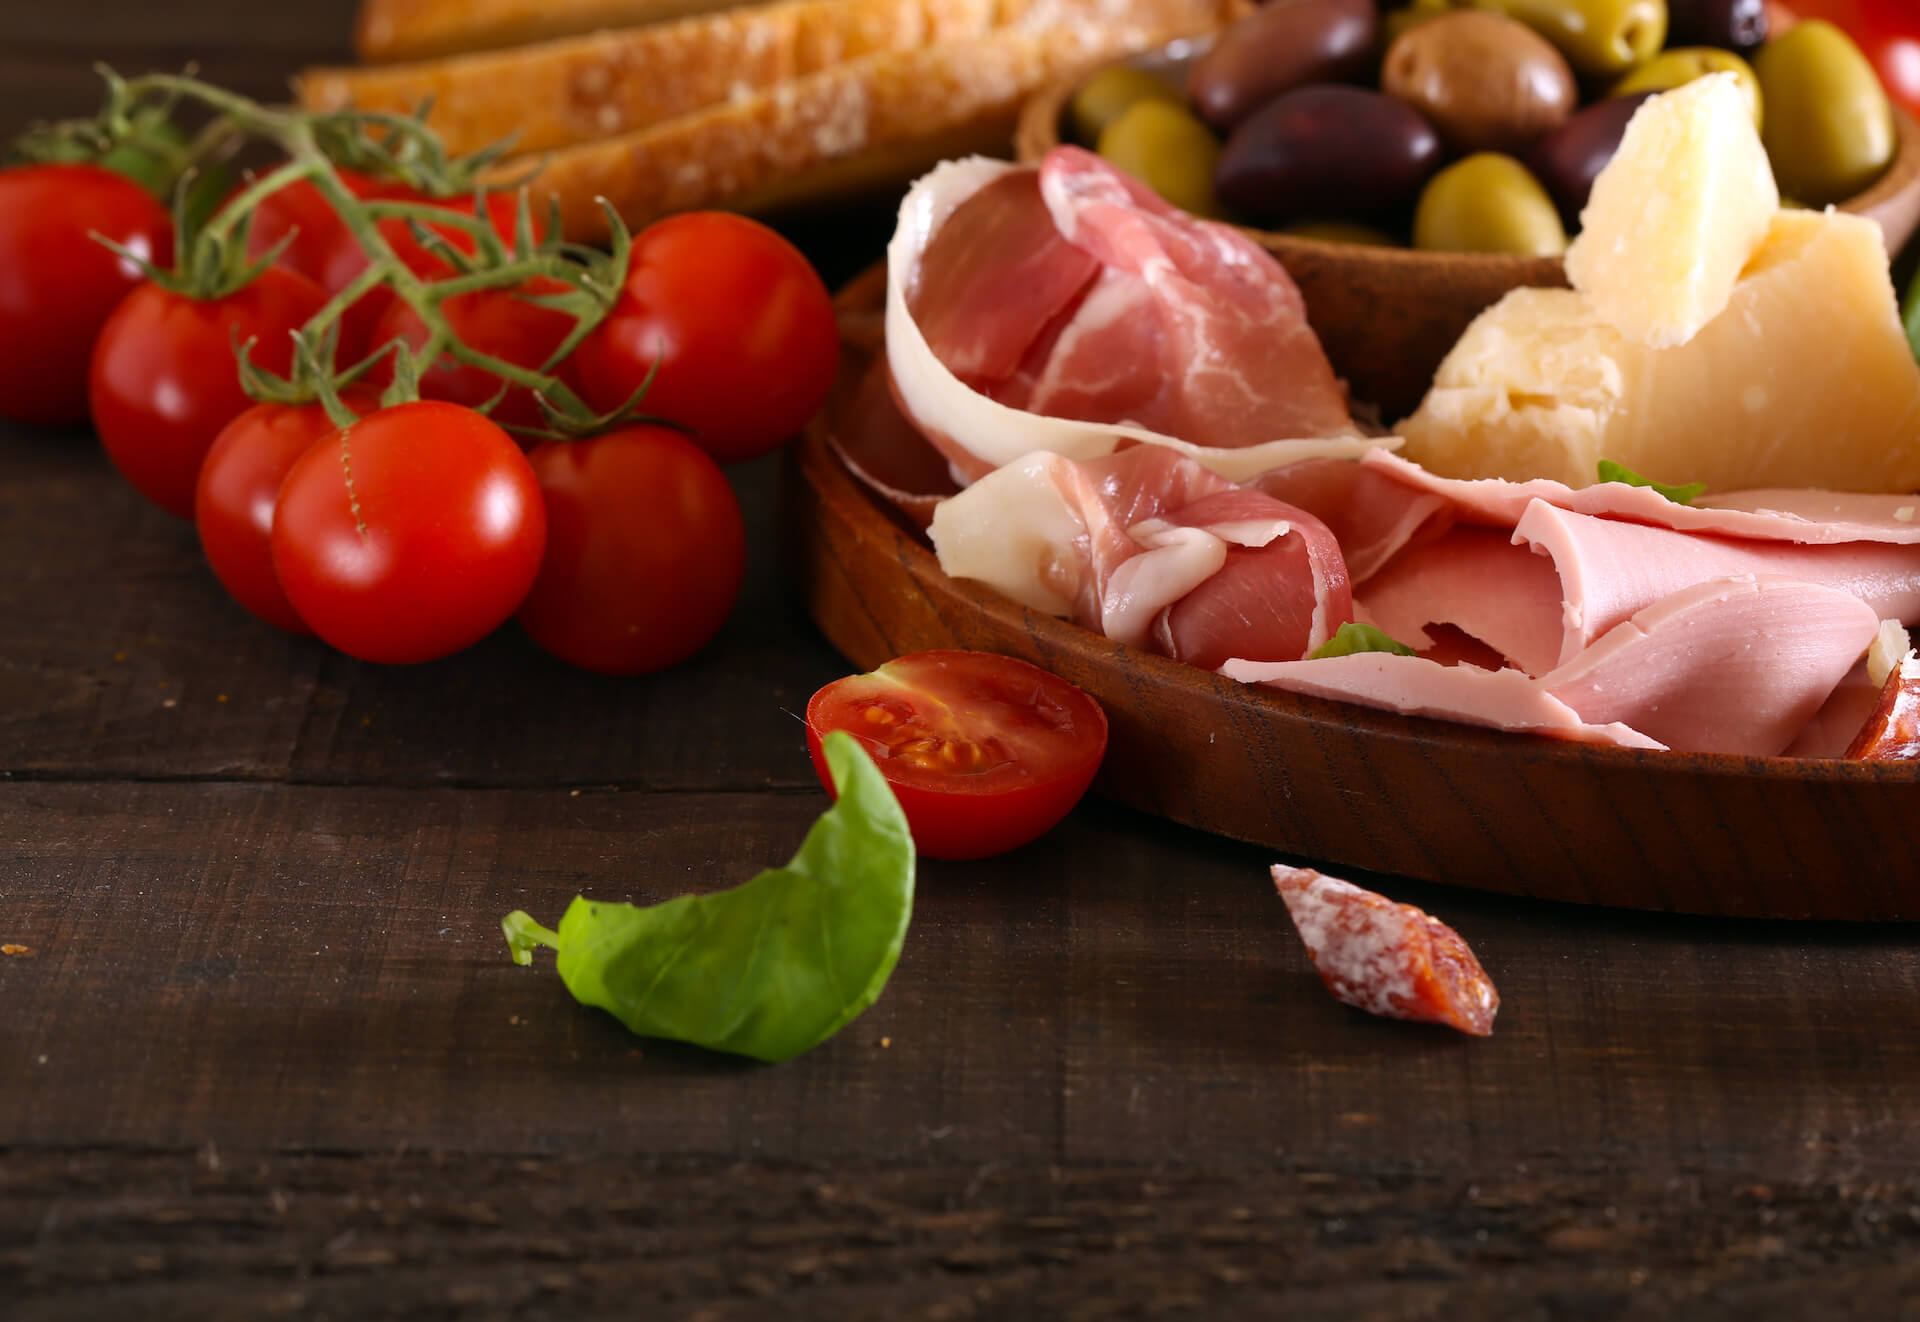 Cibo tipico italiano